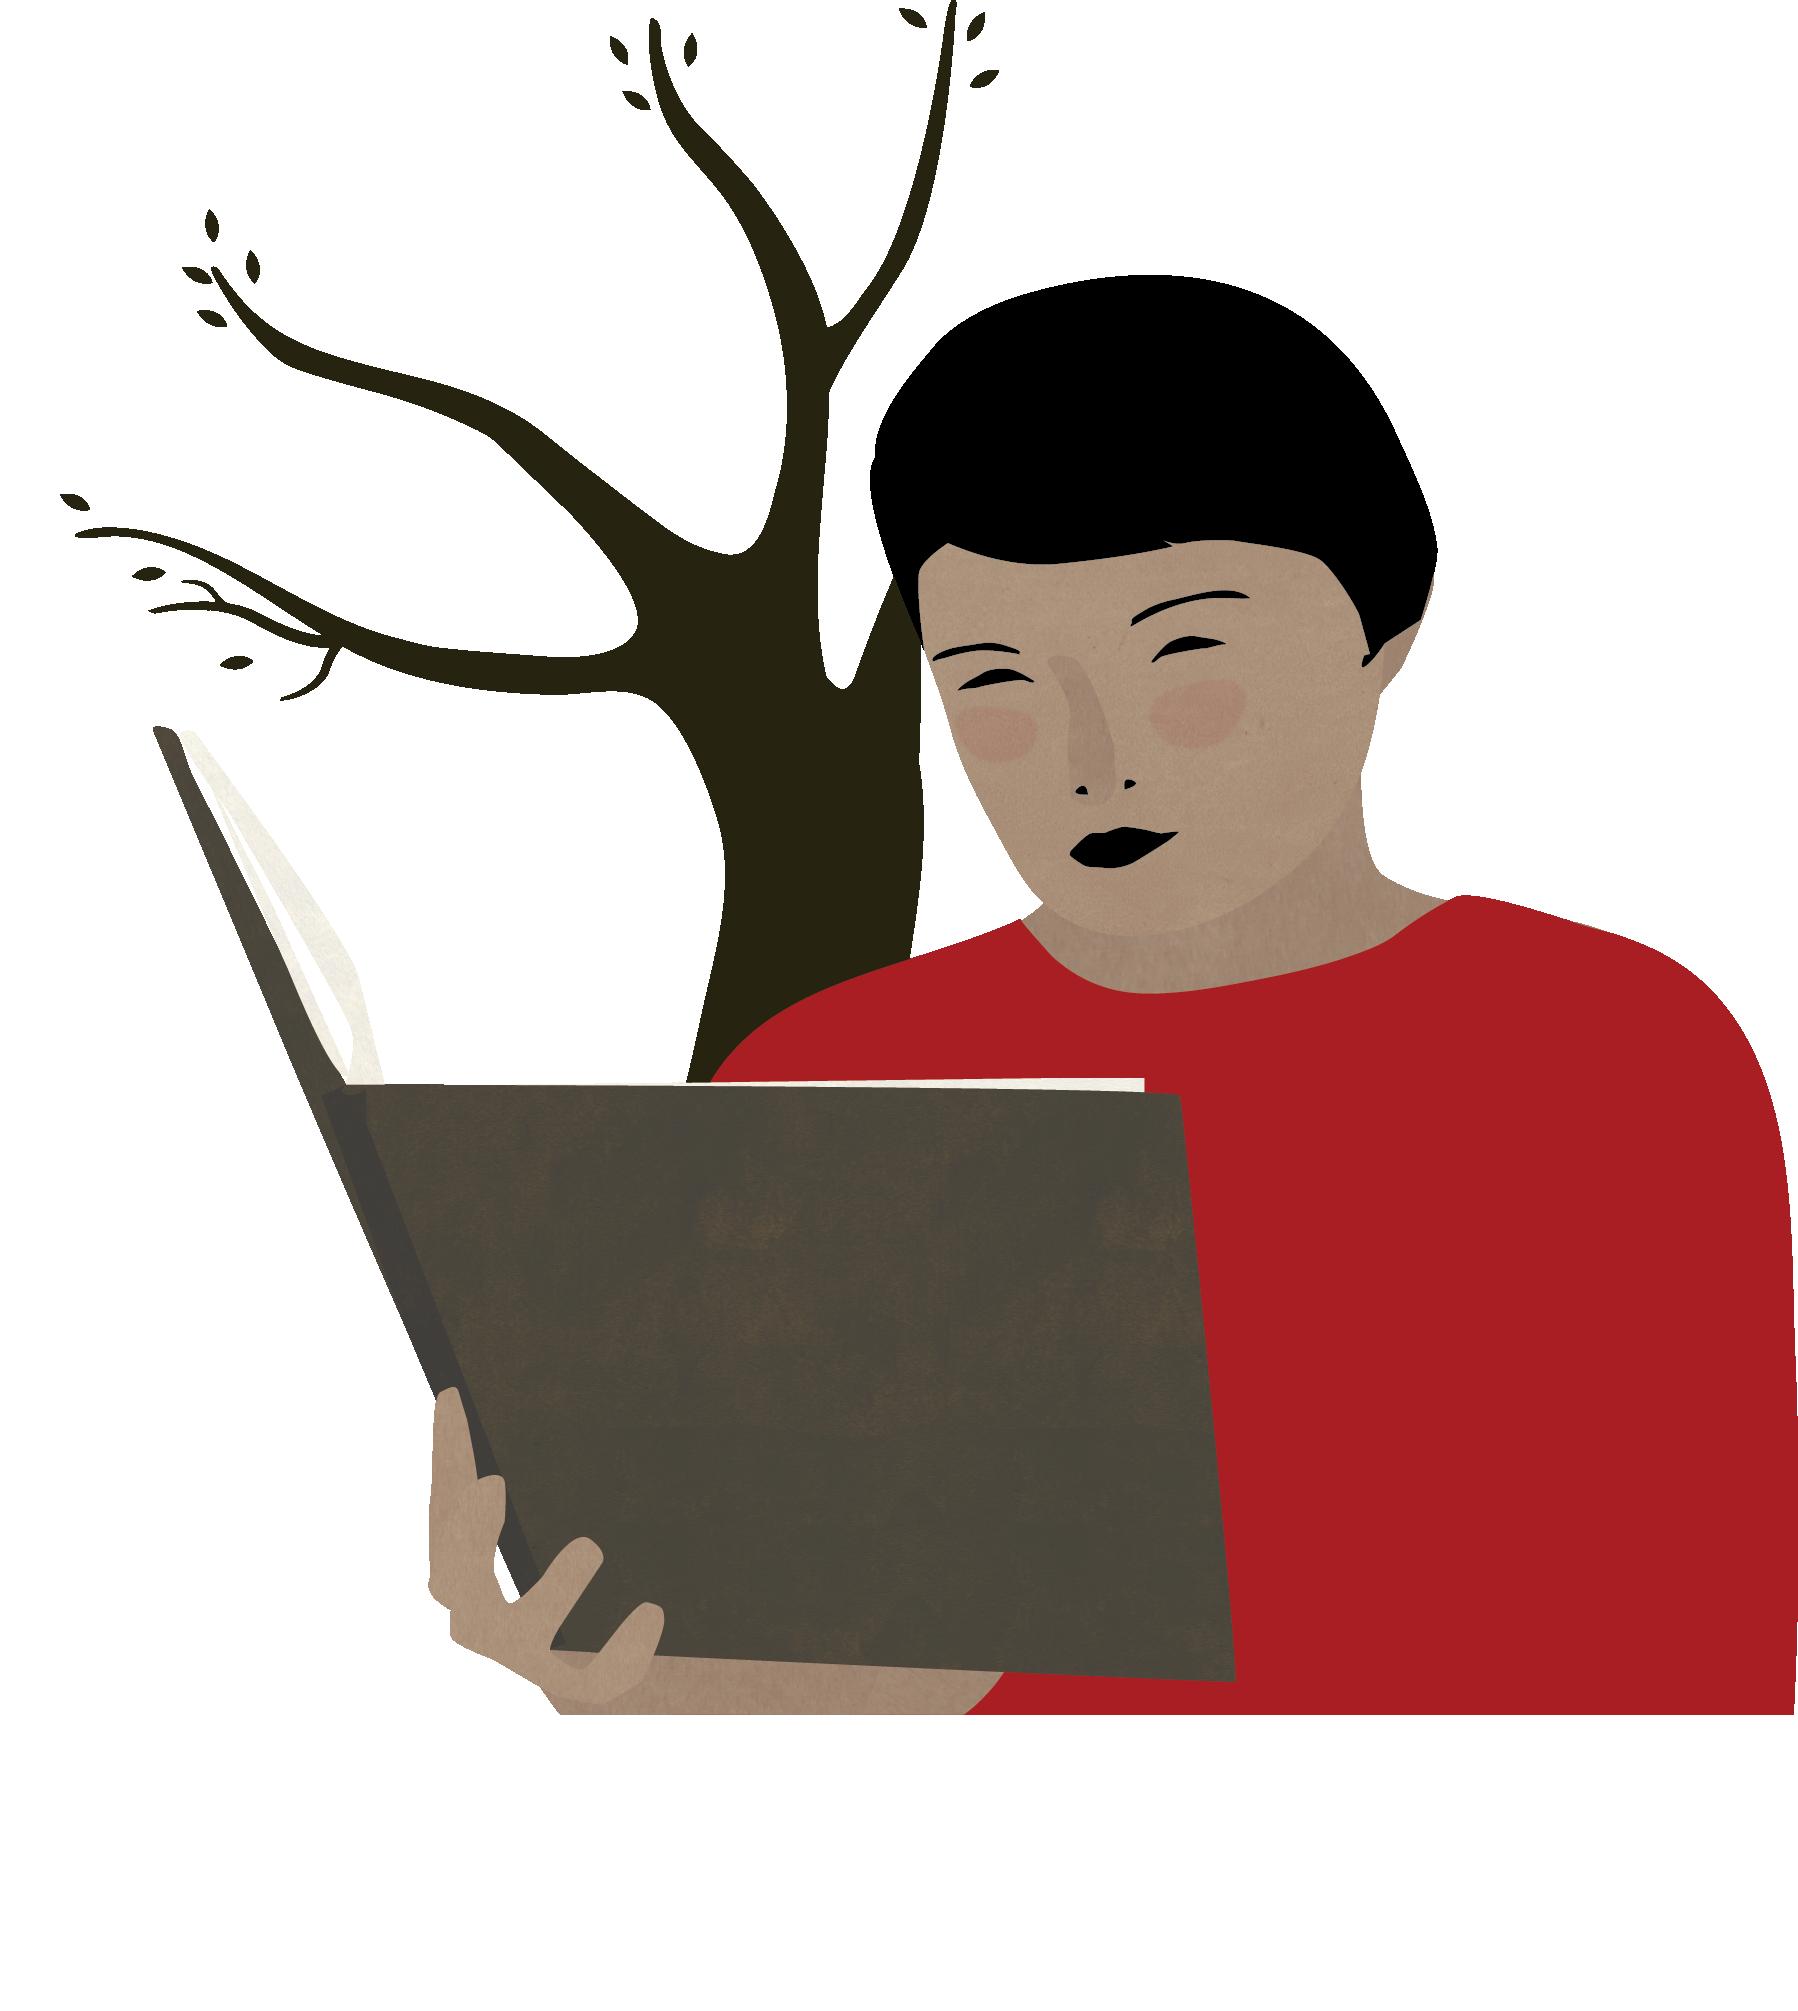 Knowledge clipart fundamental skill. Essential reading text aboriginal